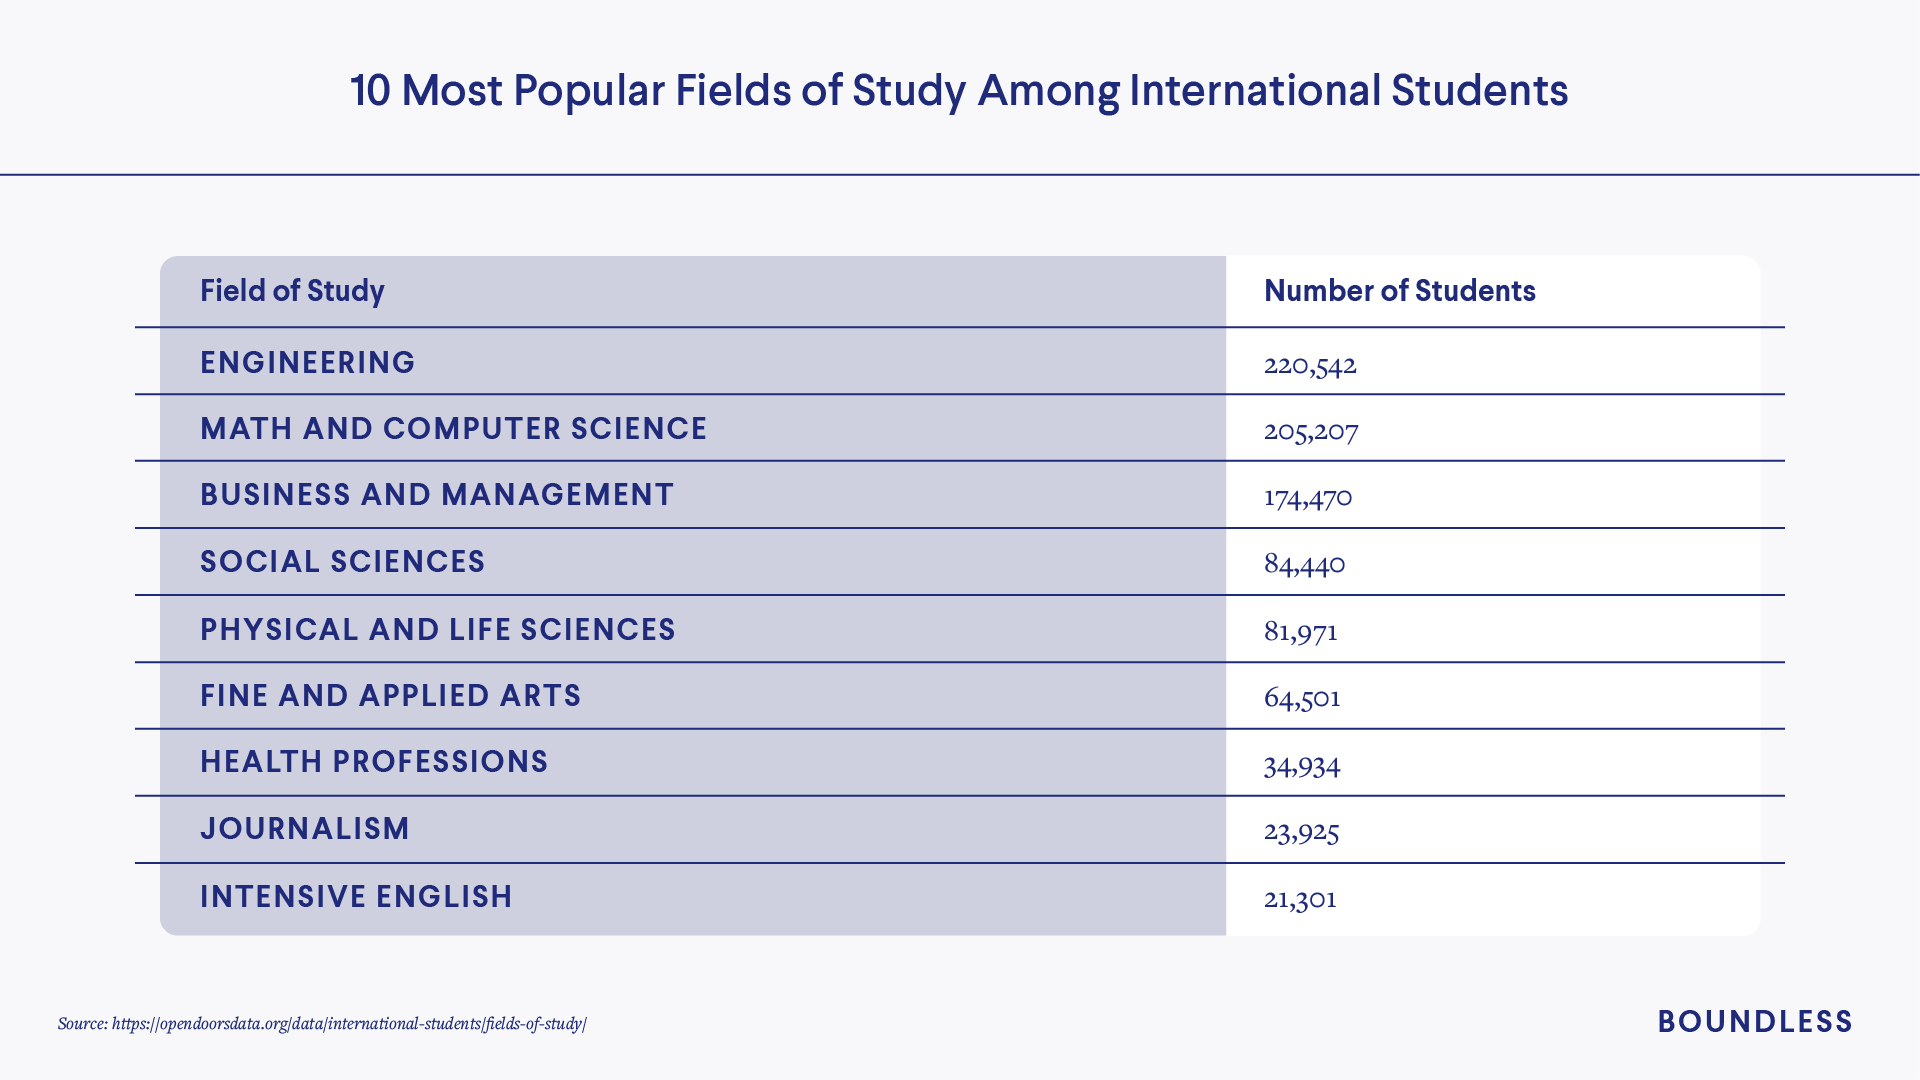 Most popular fields of study for U.S. international students